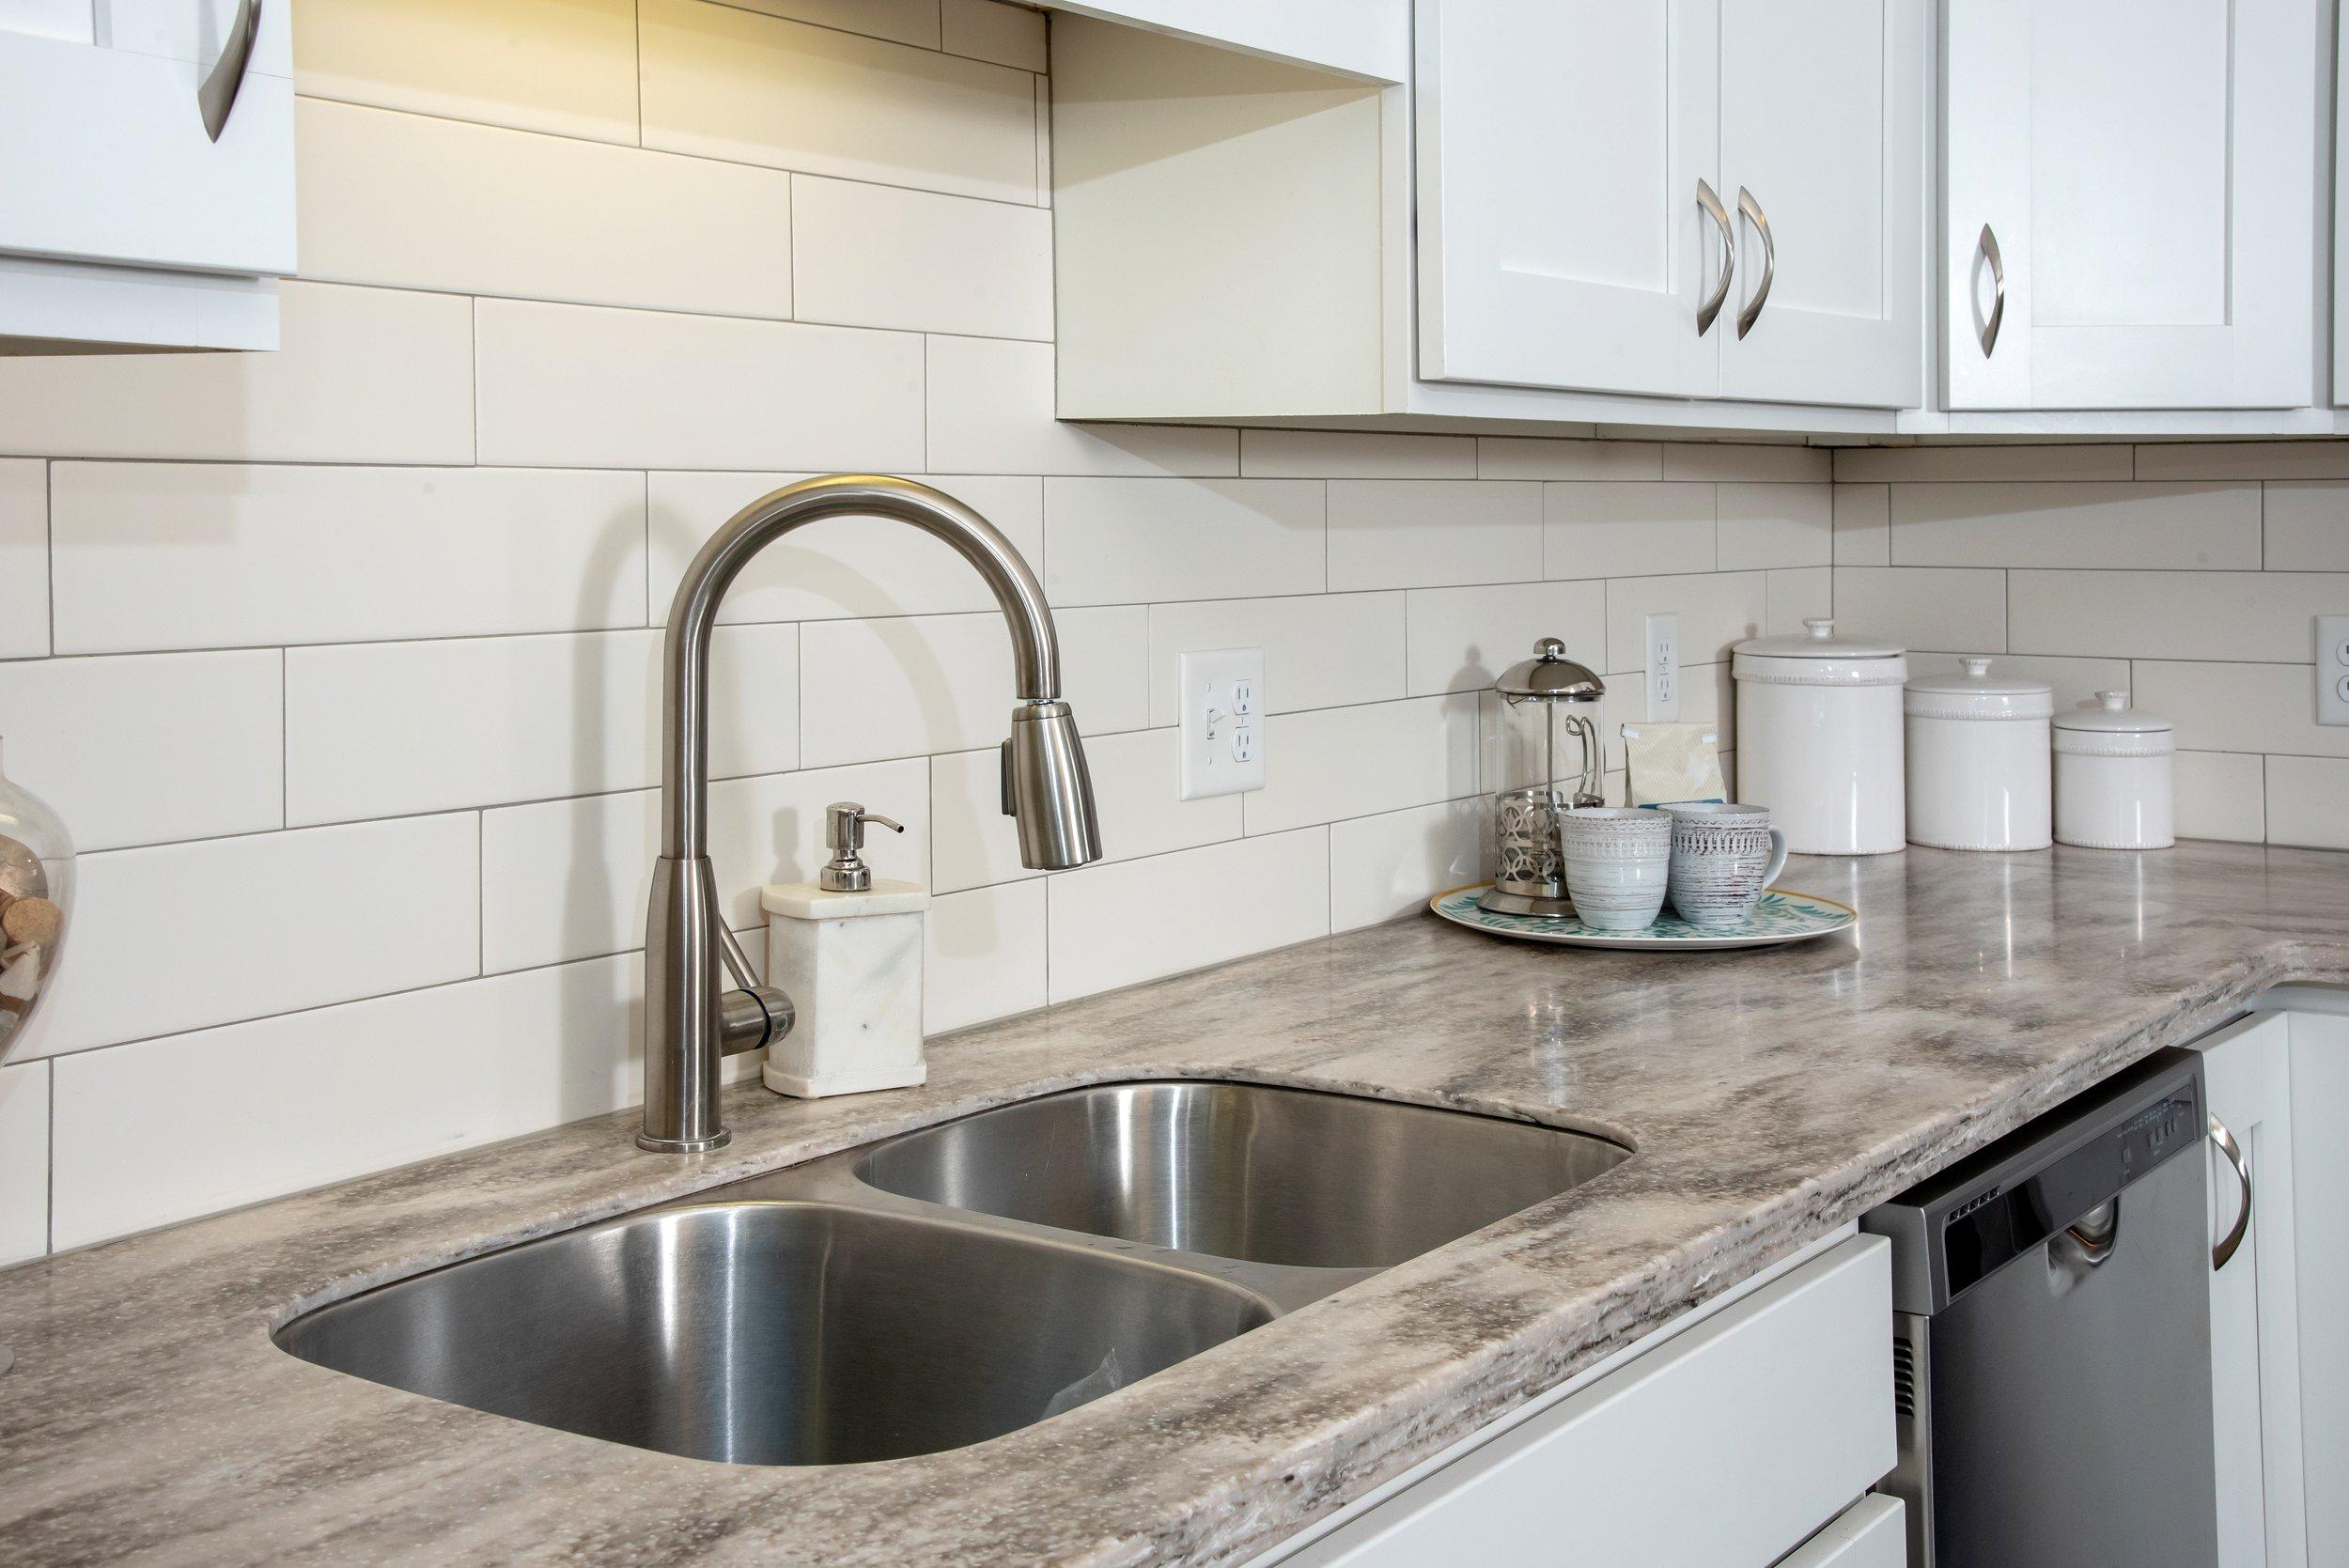 02-Granite Counter-tops _ Stainless Steel Appliances.jpg